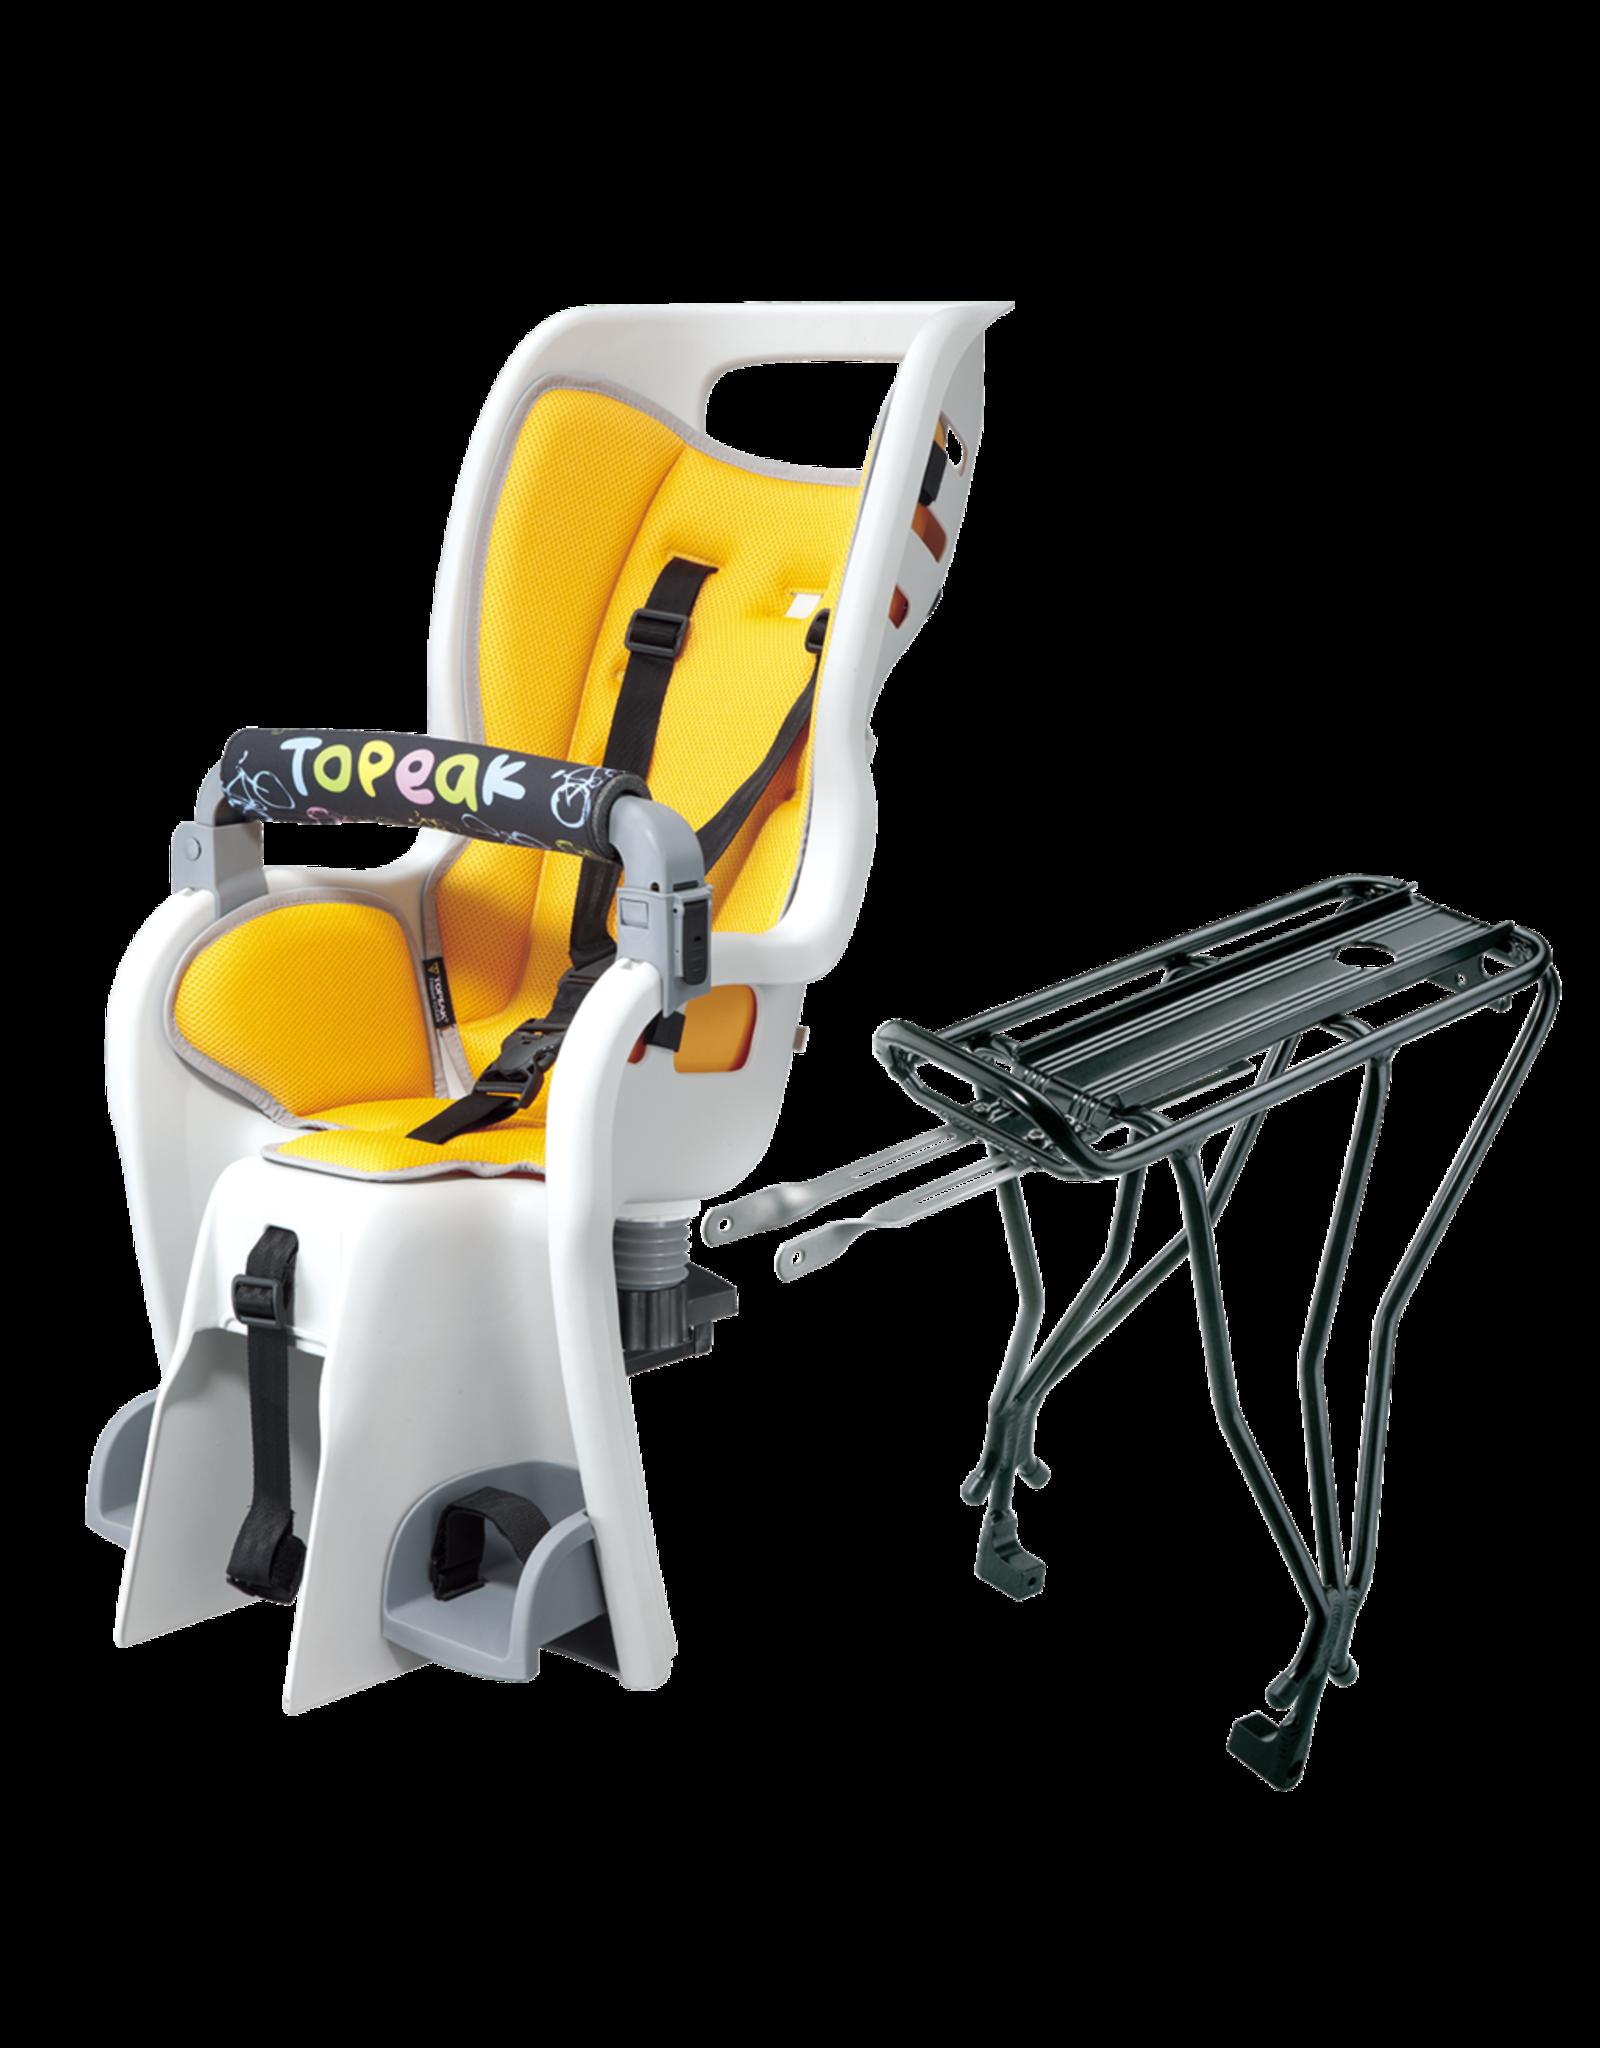 Topeak Topeak Baby Seat II w/rack (fits disc brakes)